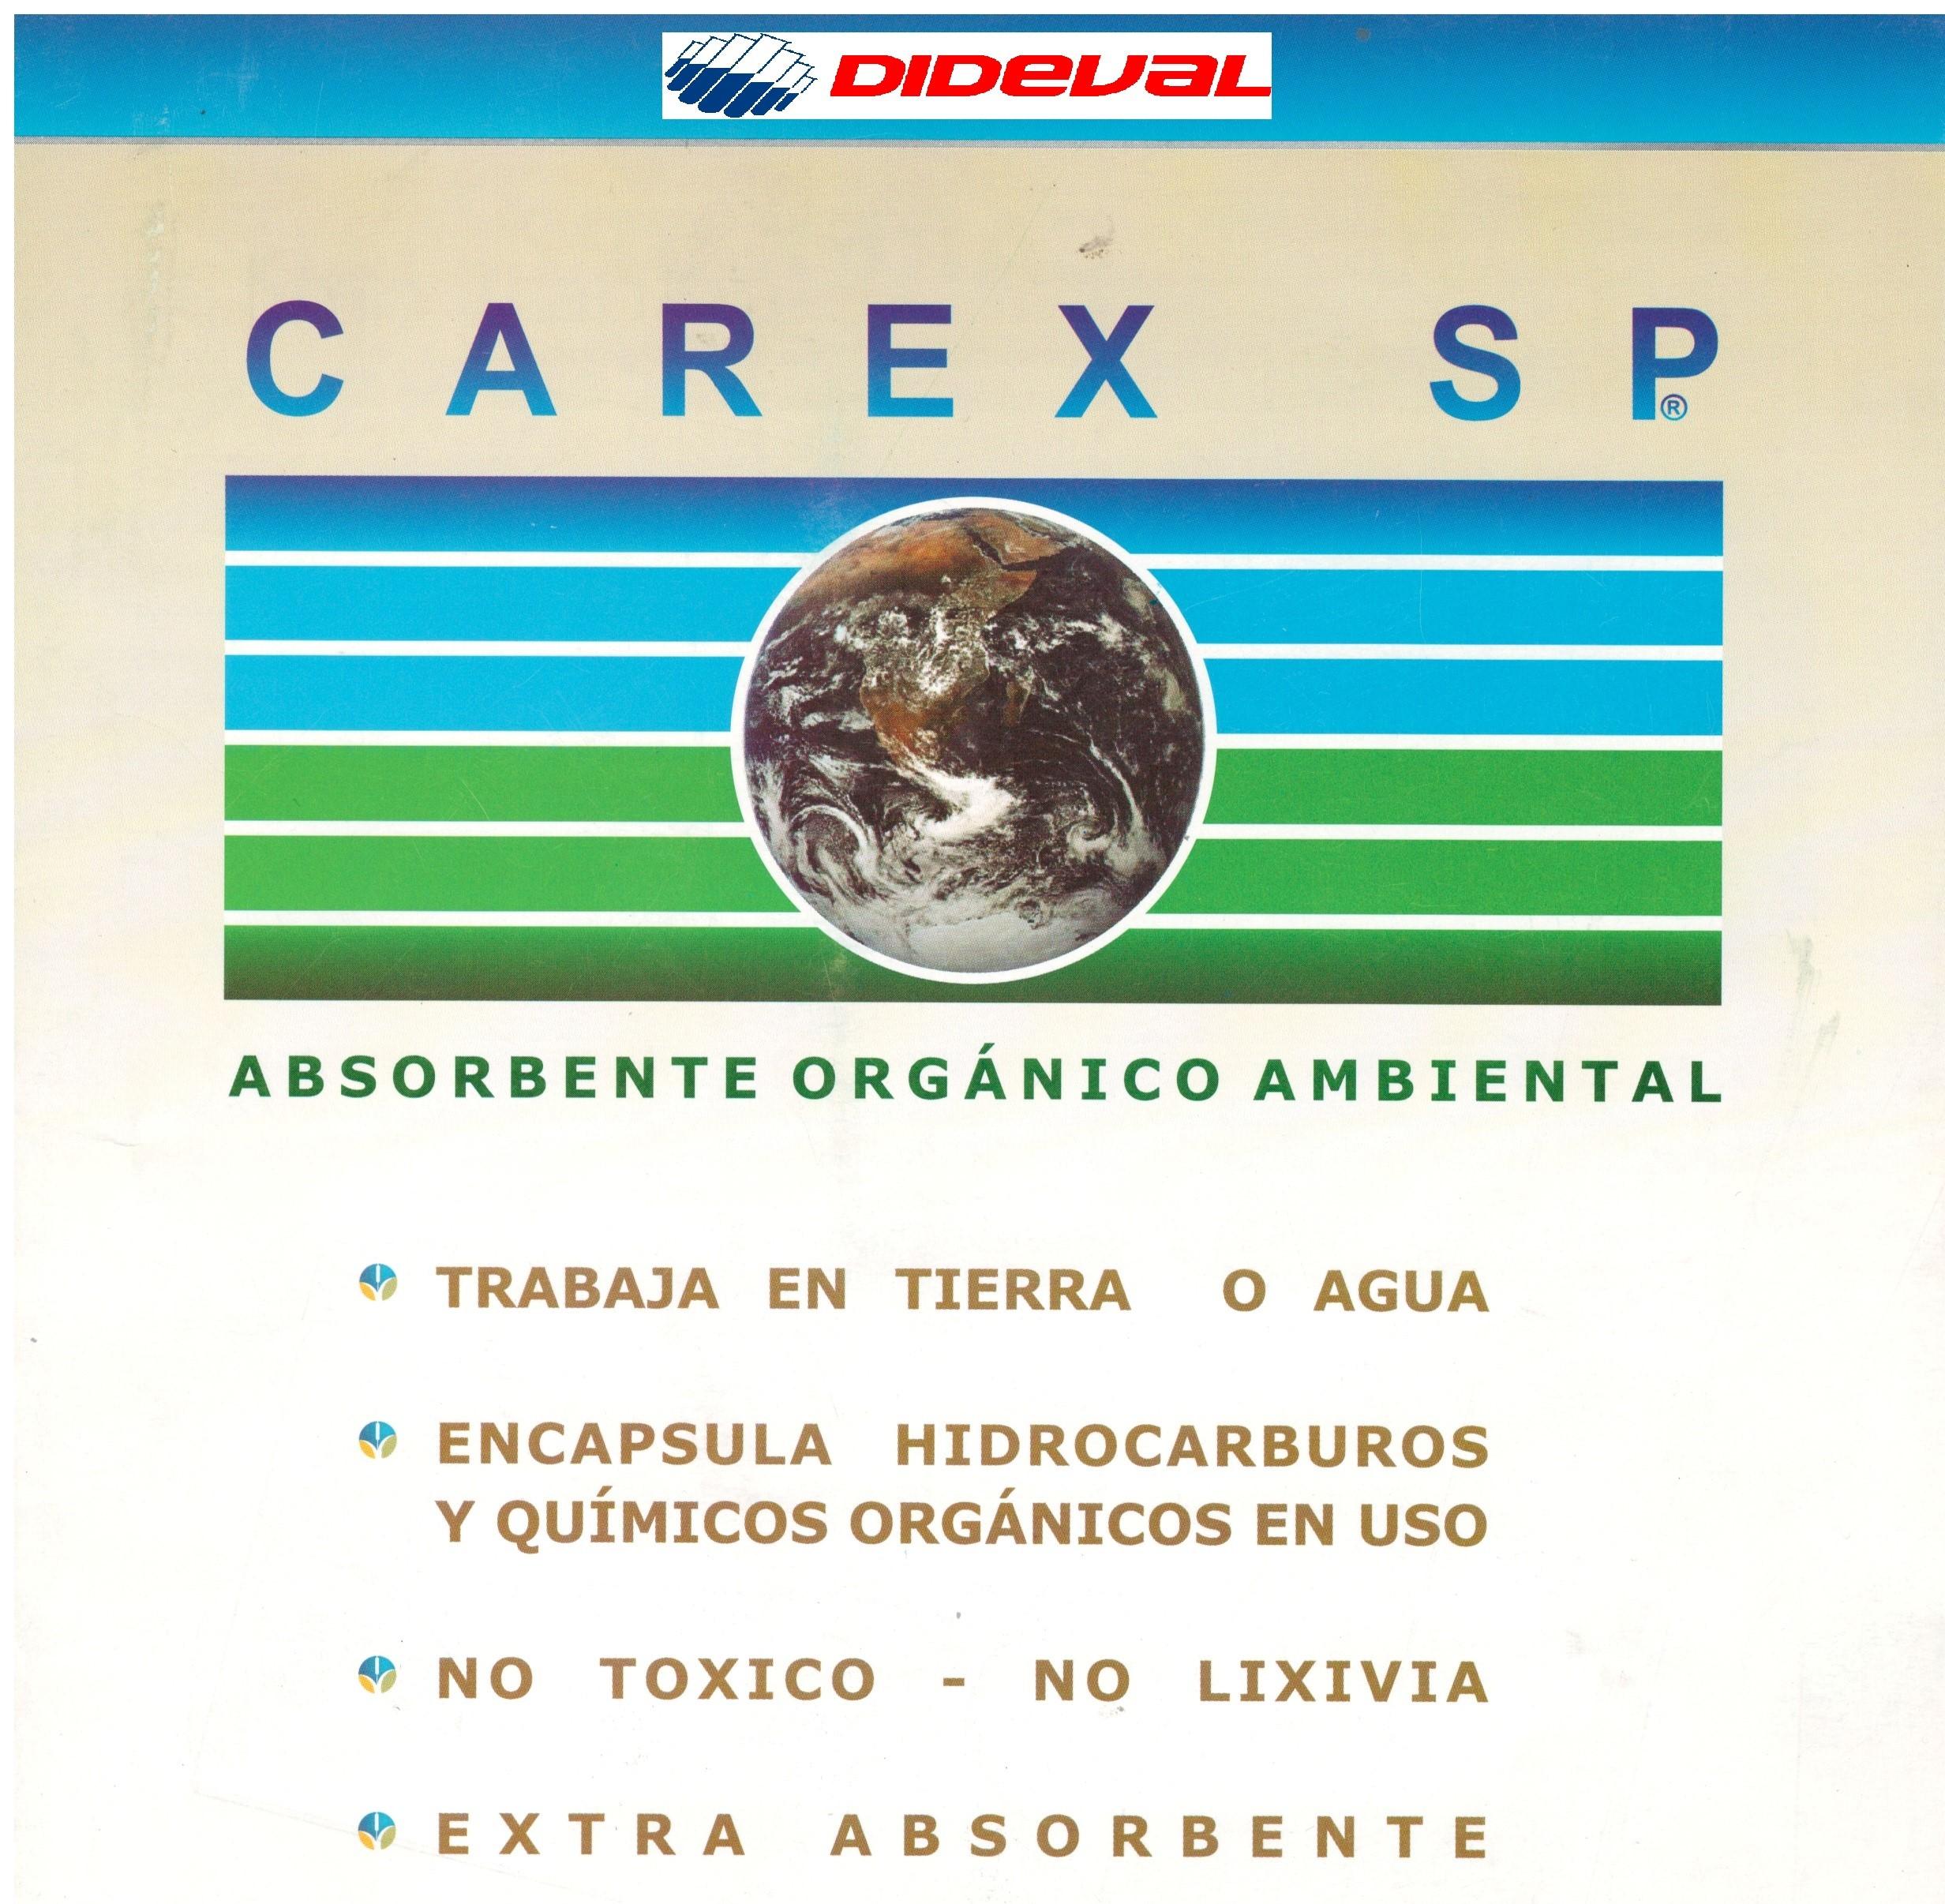 Absorbente orgánico ambiental CAREX SP